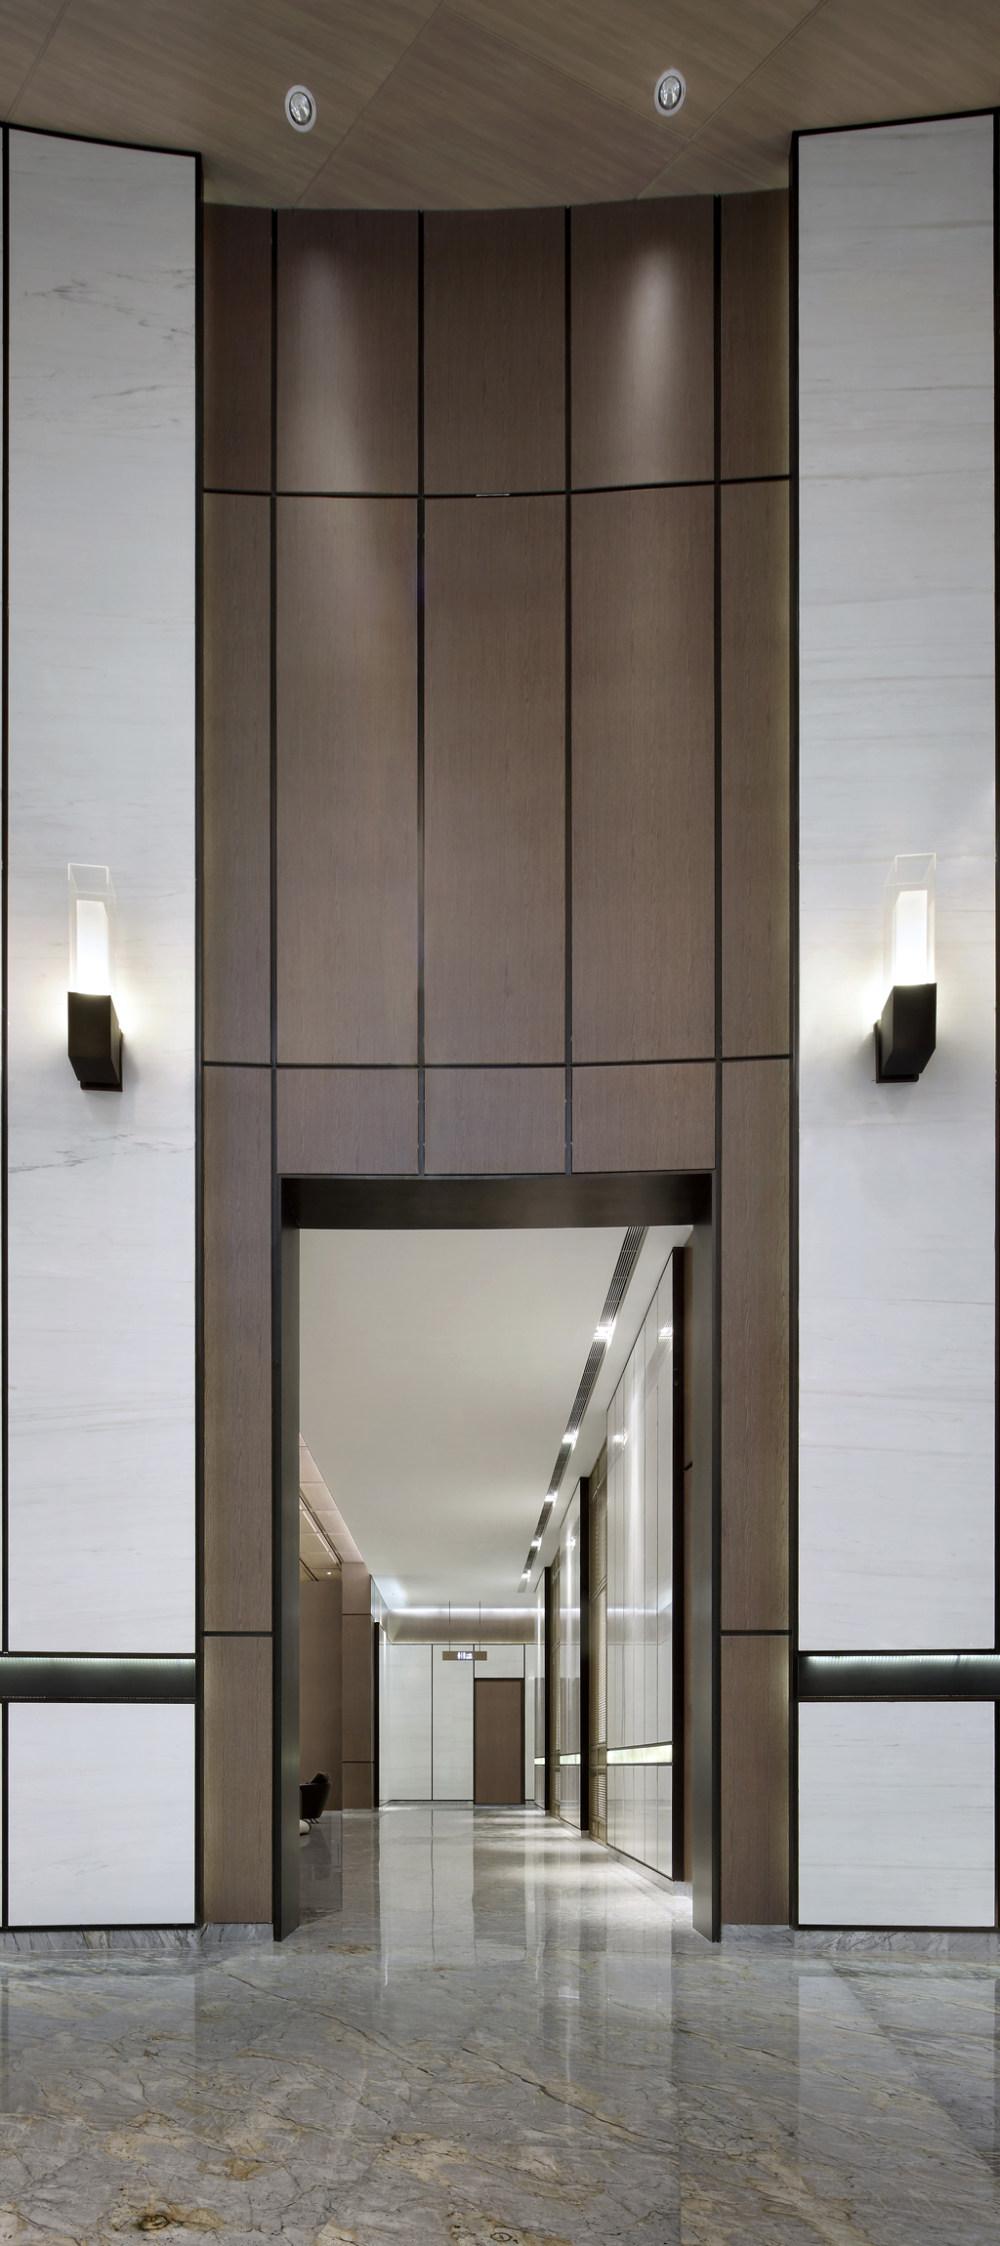 【KSL设计事务所新作】阳光粤海门花园售楼中心_009.jpg